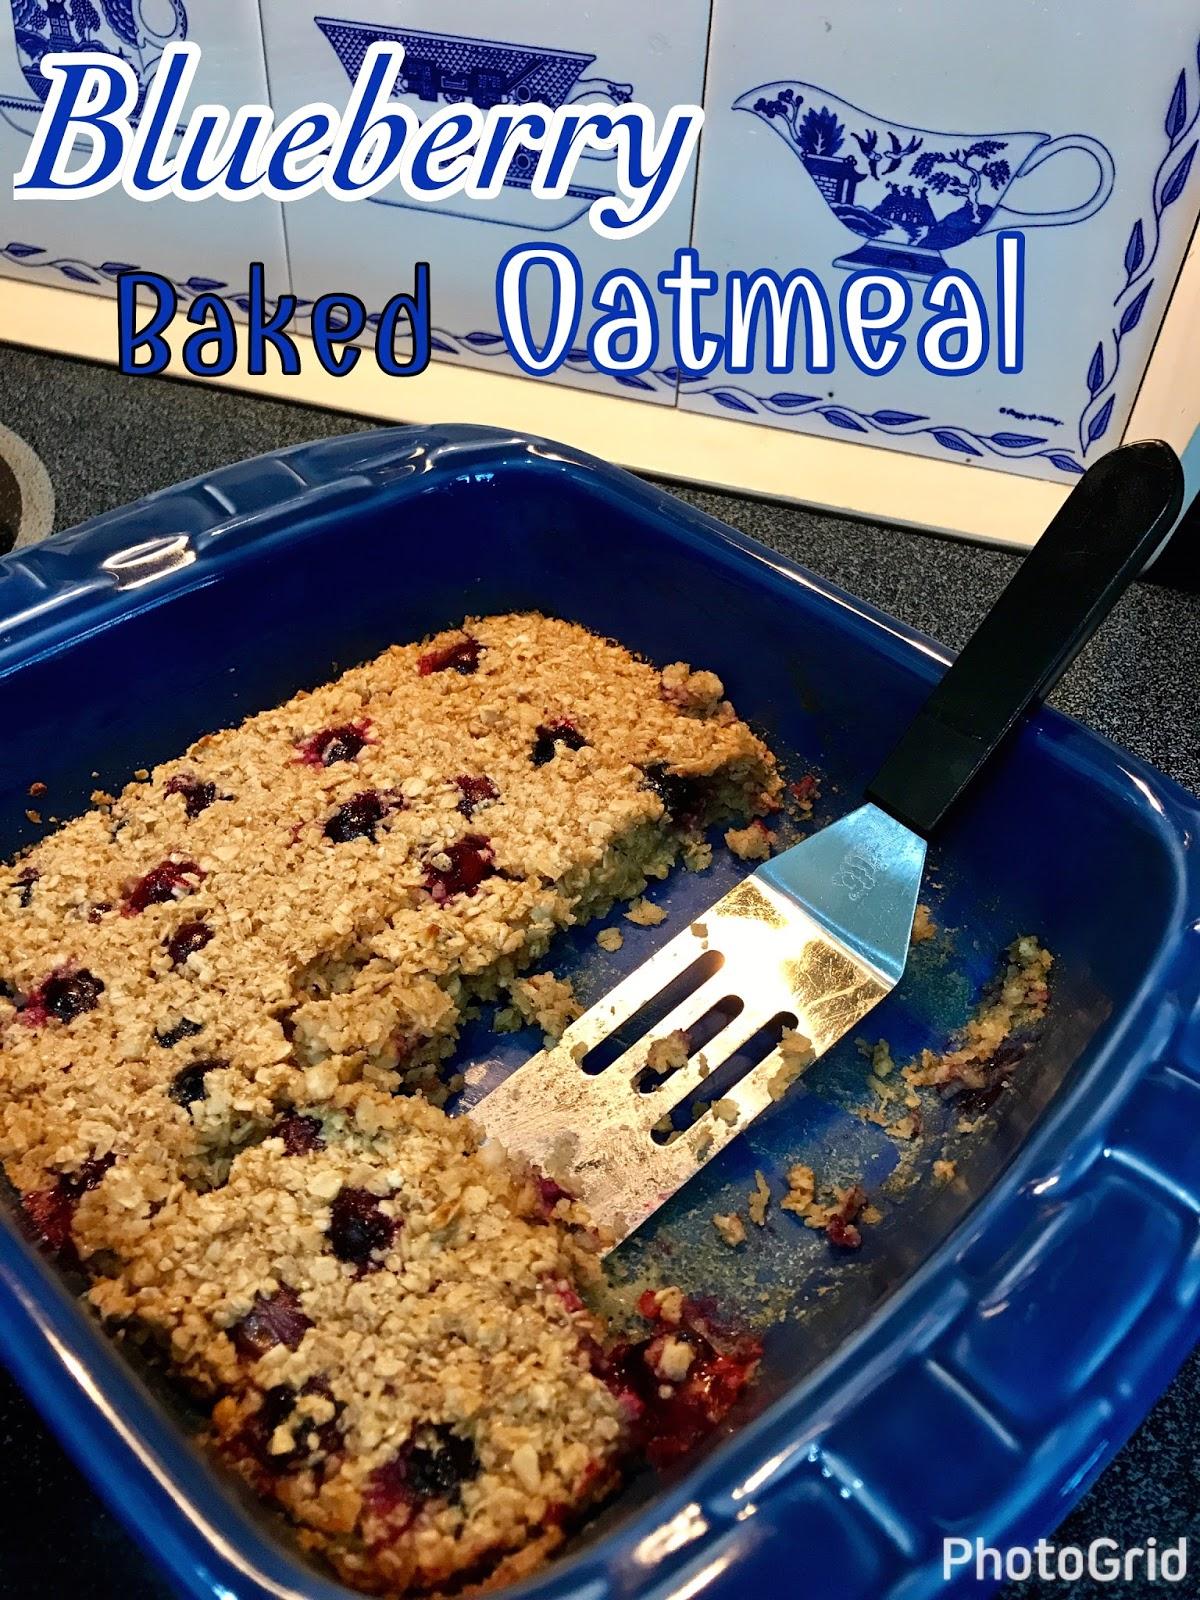 Rita S Recipes Blueberry Baked Oatmeal